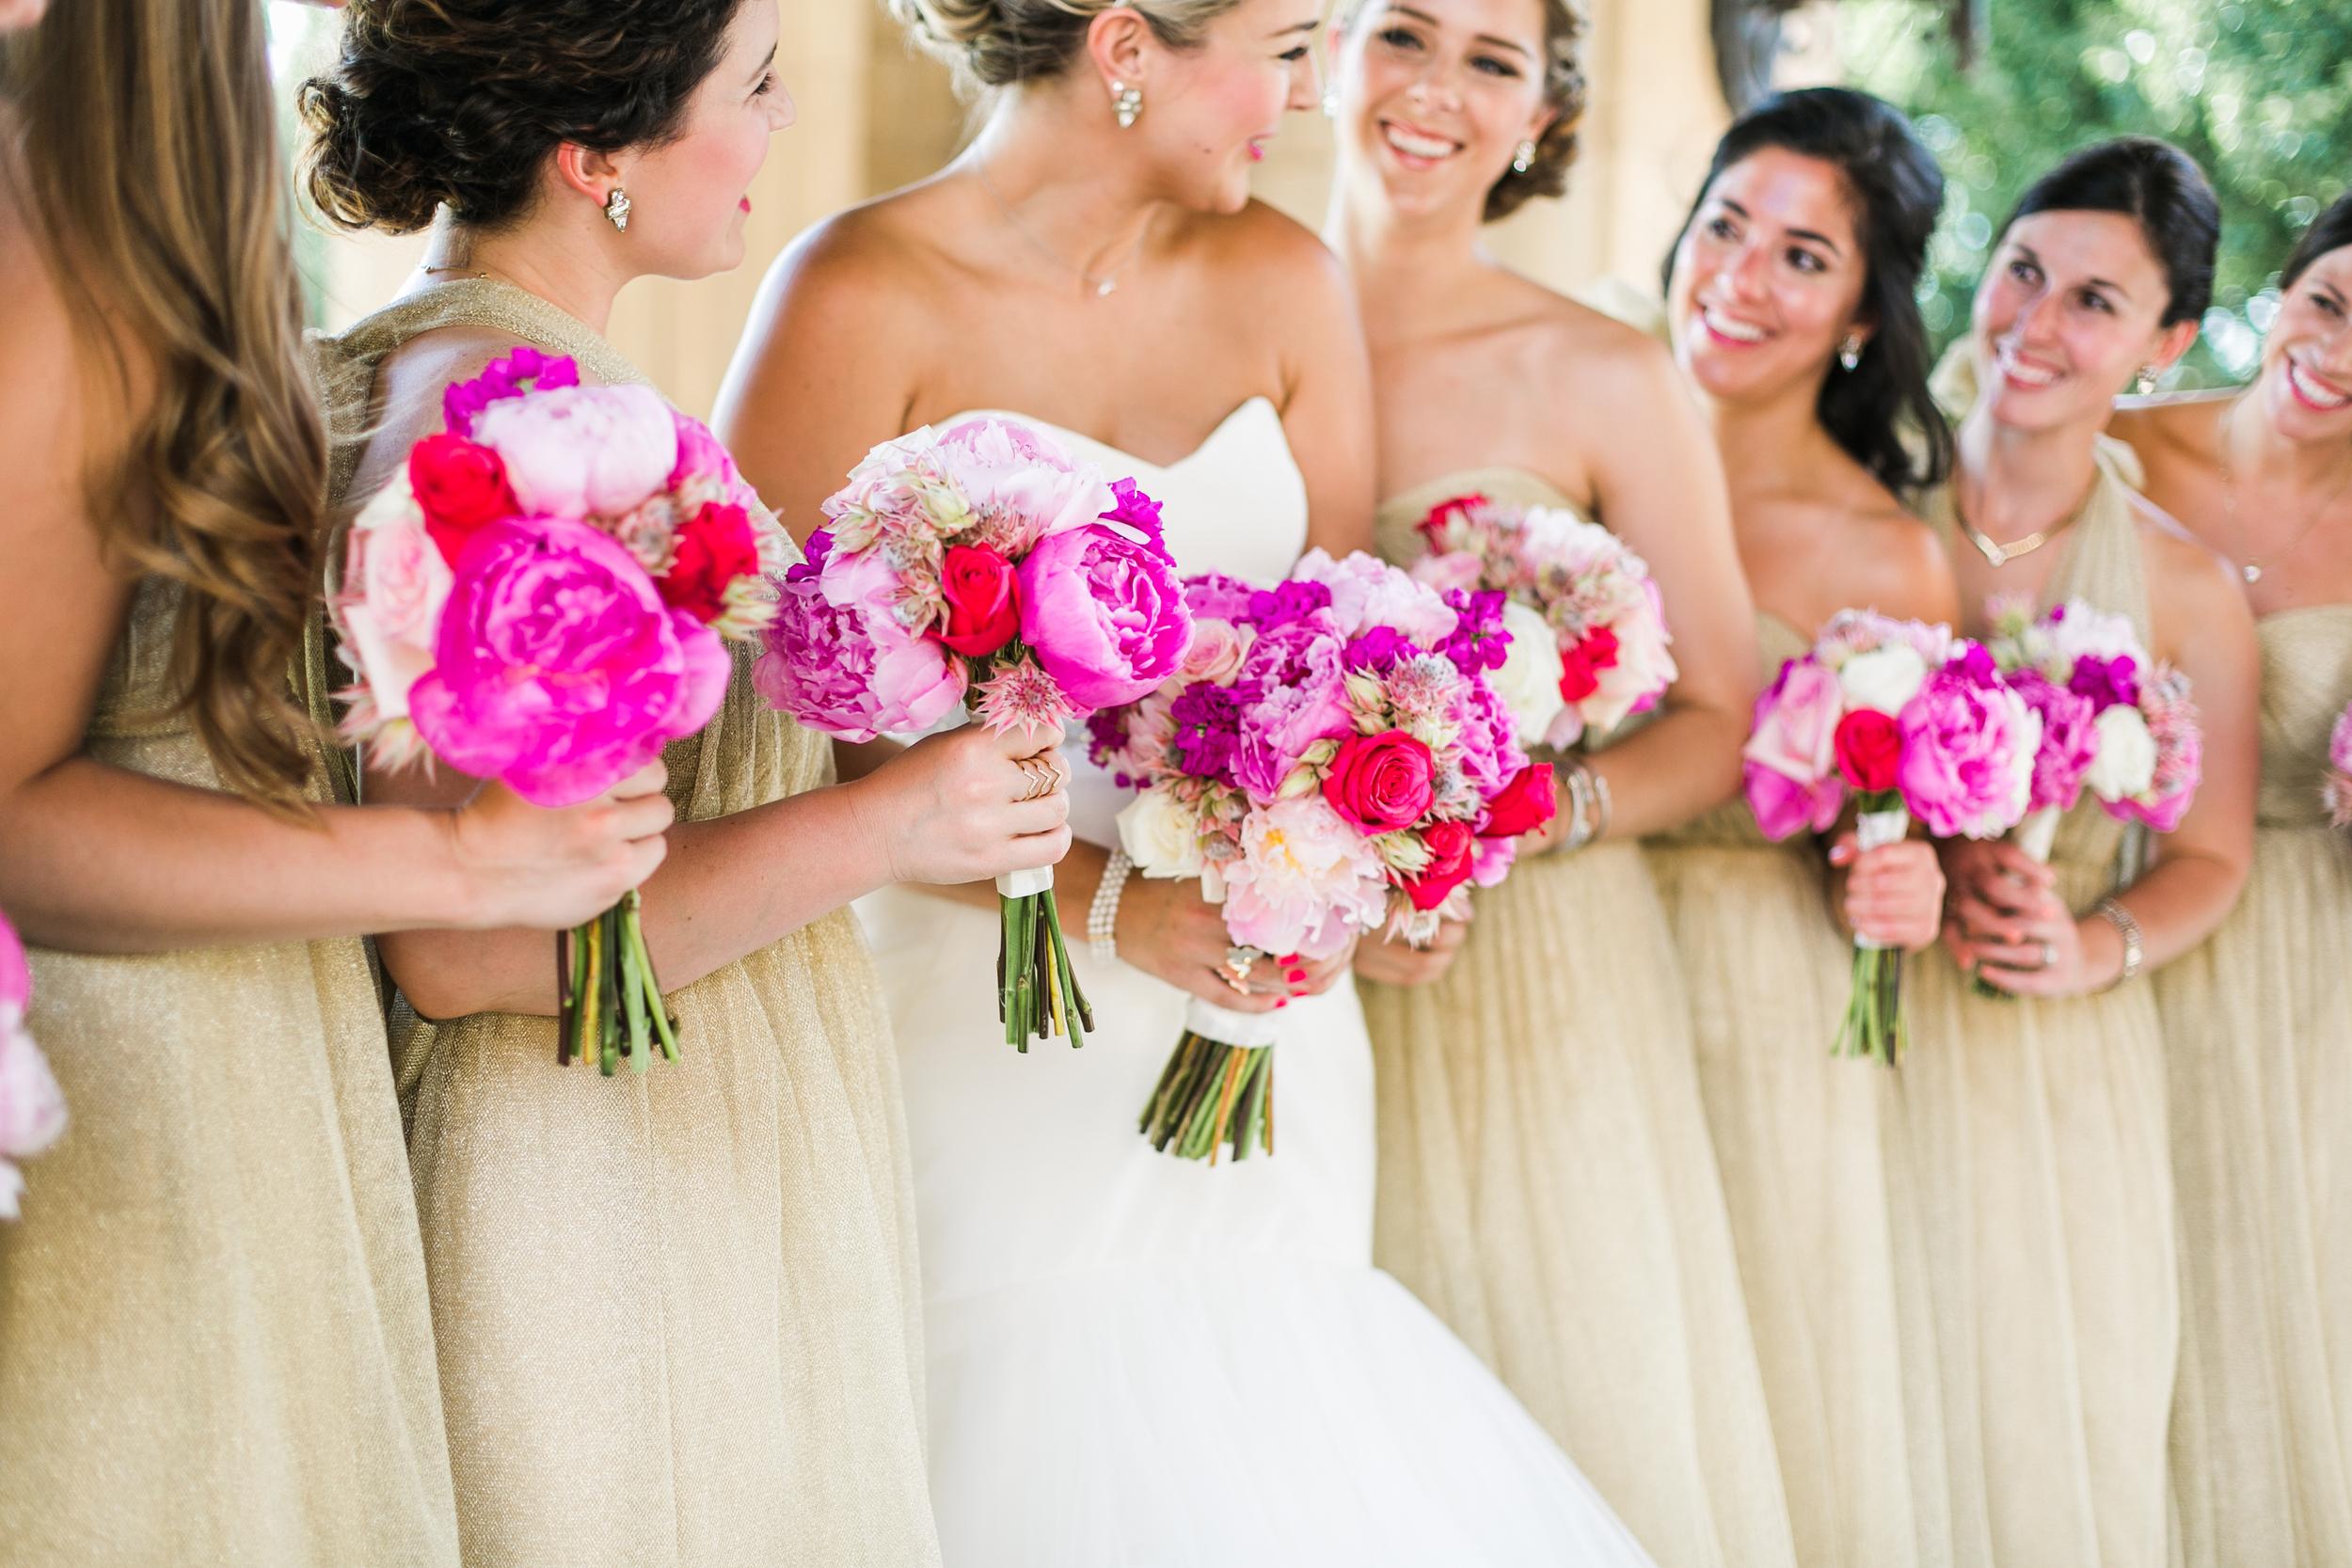 Bliss OKC | Aubrey Marie Photography | Tony Foss Flowers | Prim Bridesmaid Boutiqute | Bridesmaids